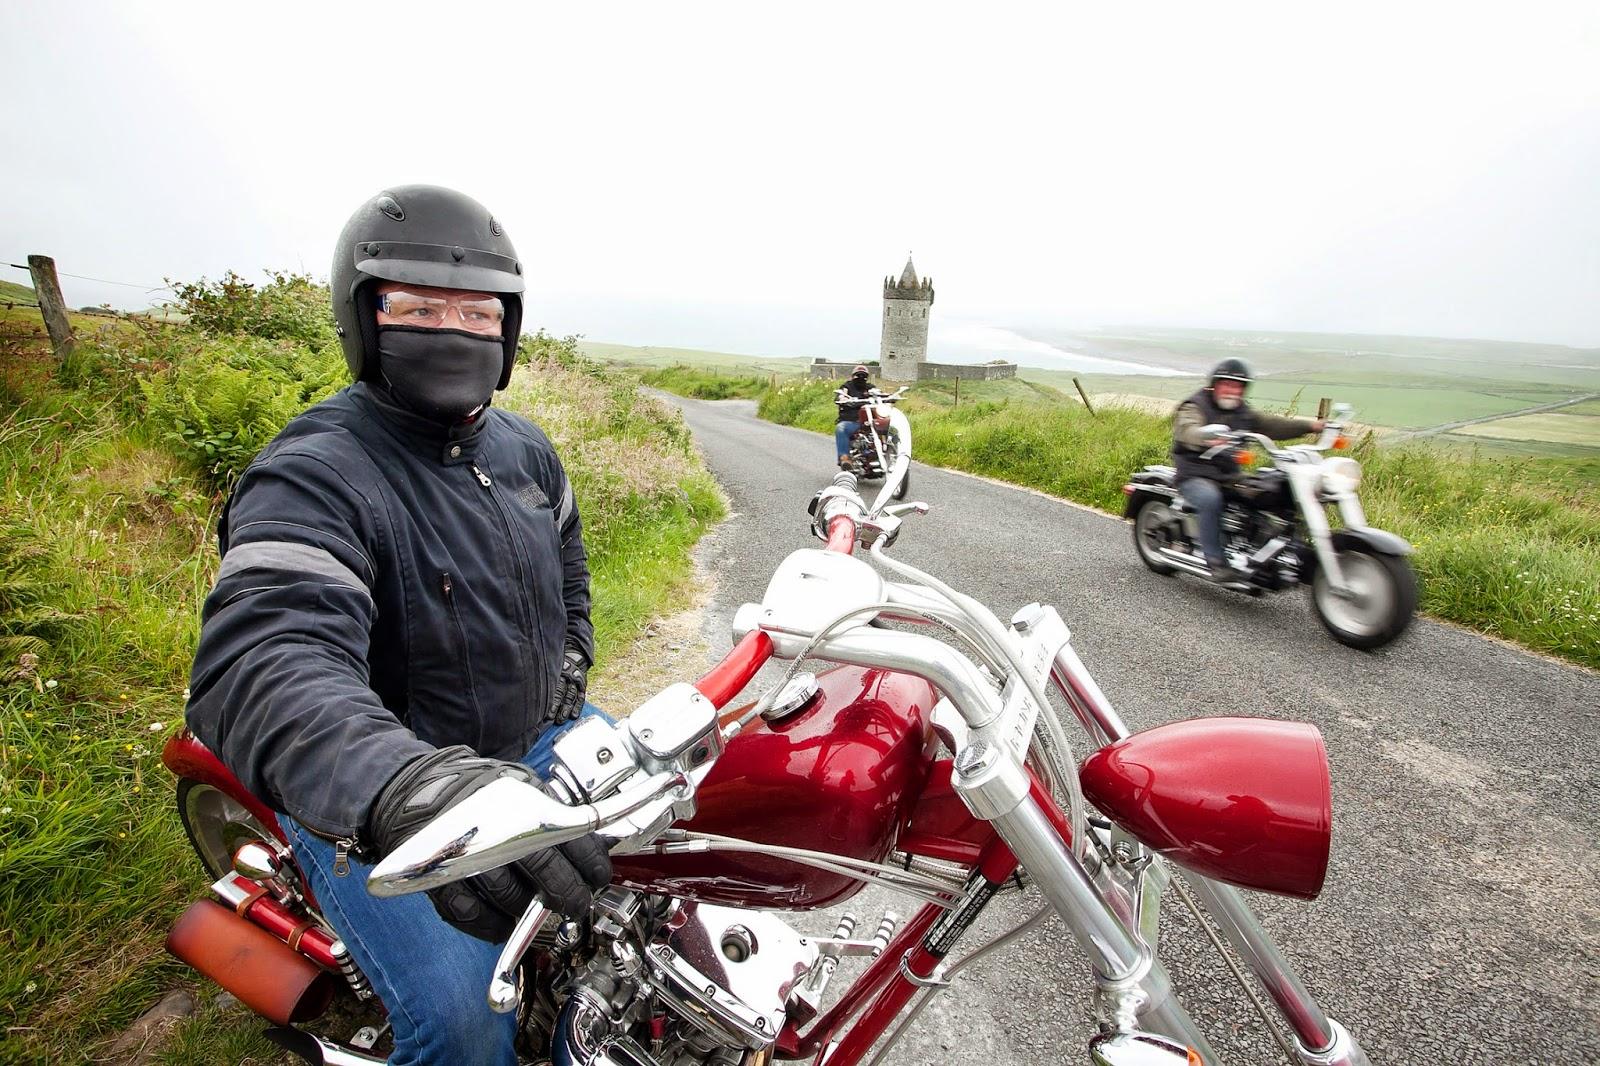 Doolin gears up for Harley Fest